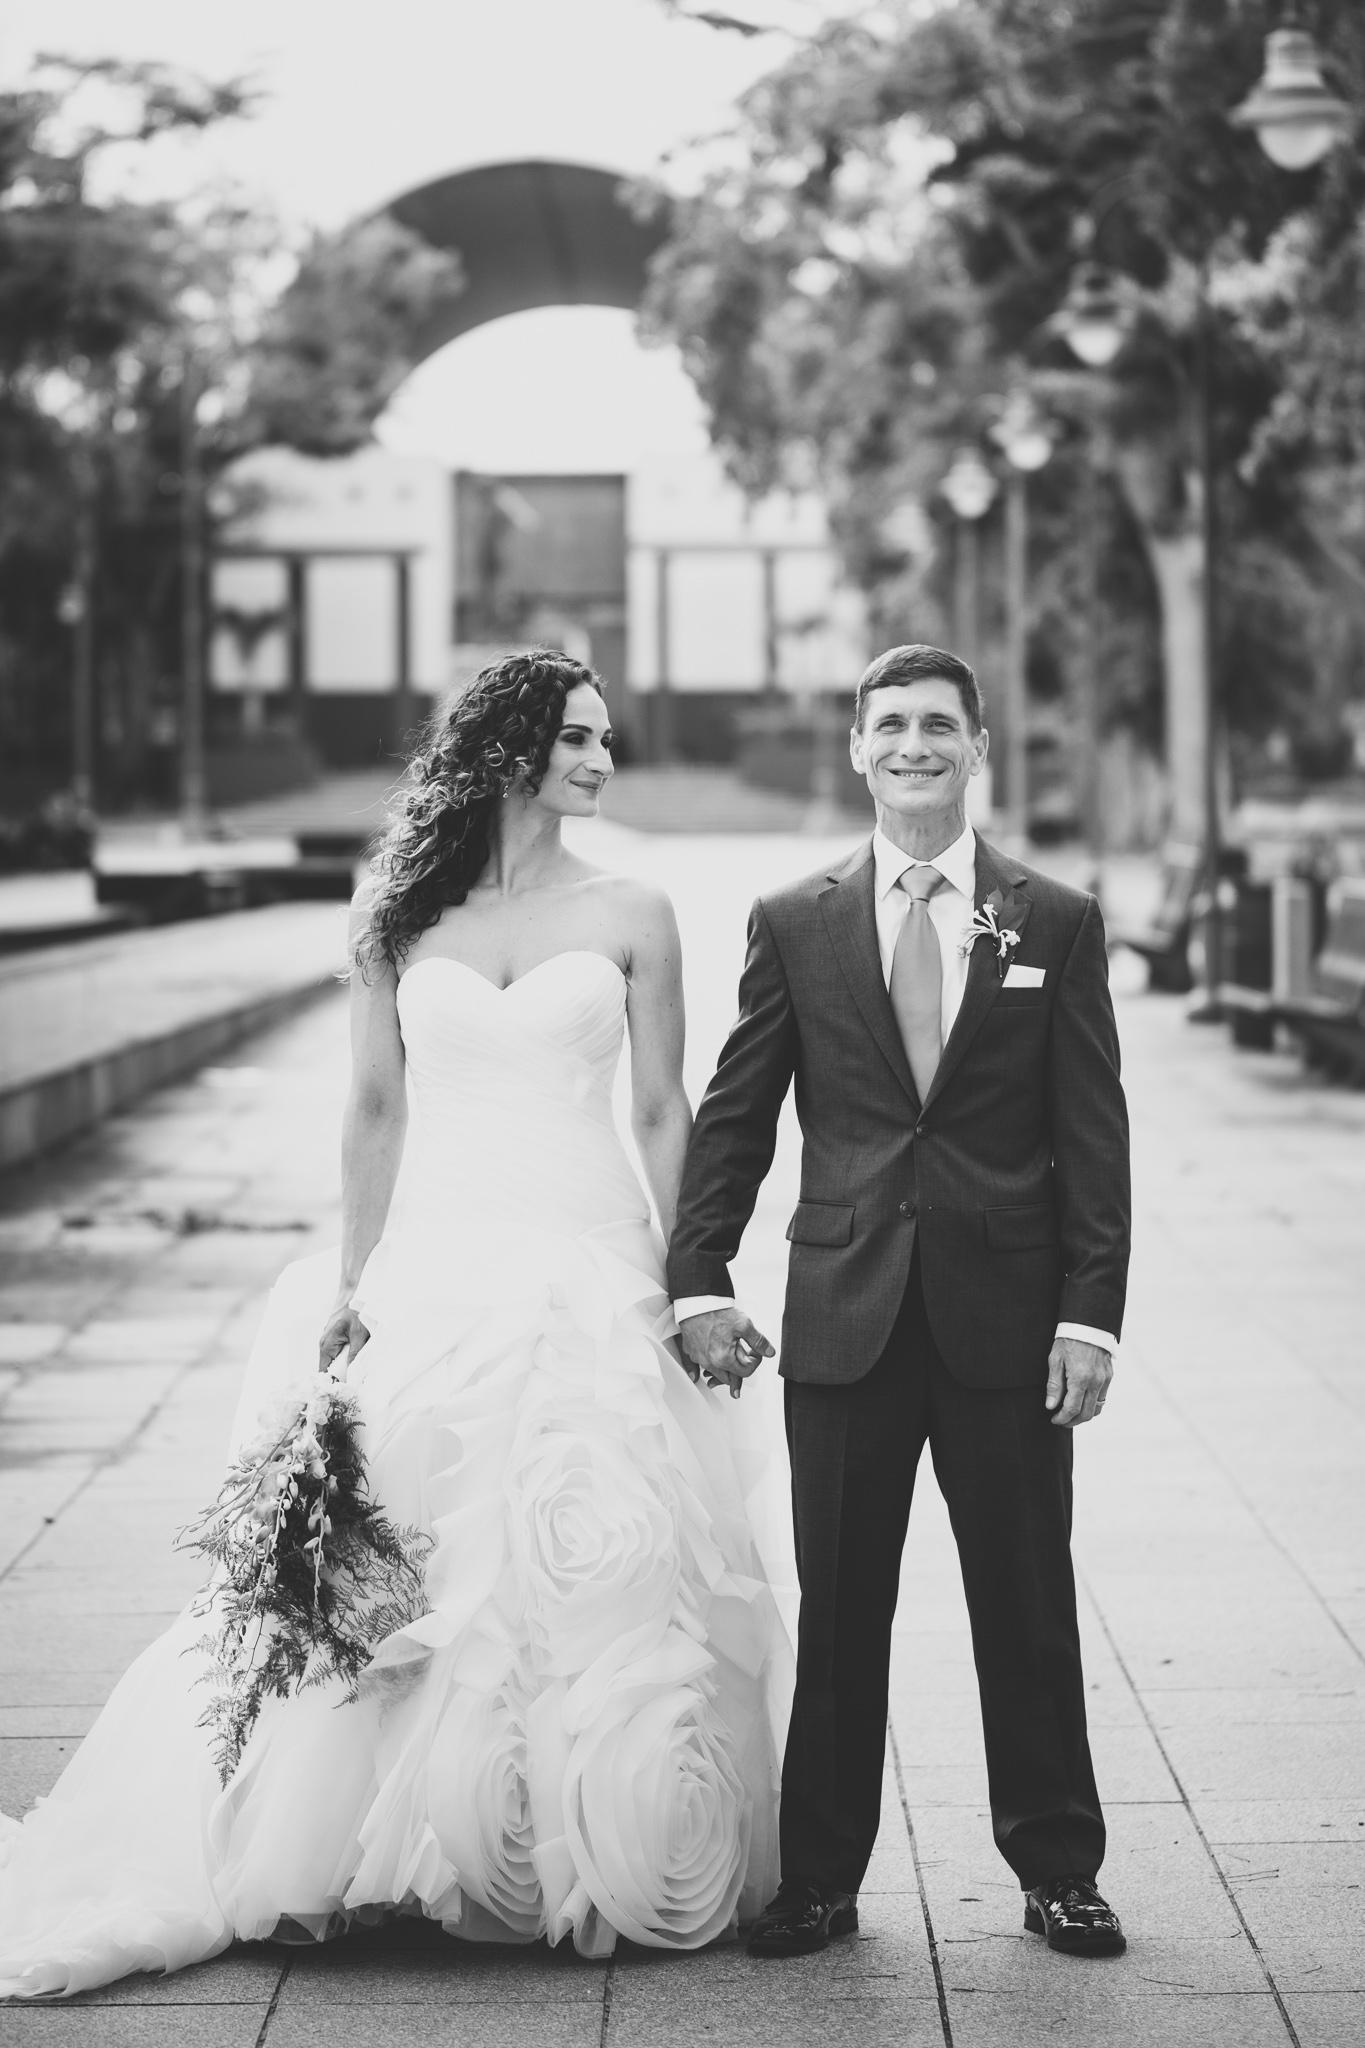 050-best-detroit-michigan-outdoor-destination-wedding-photographer.jpg